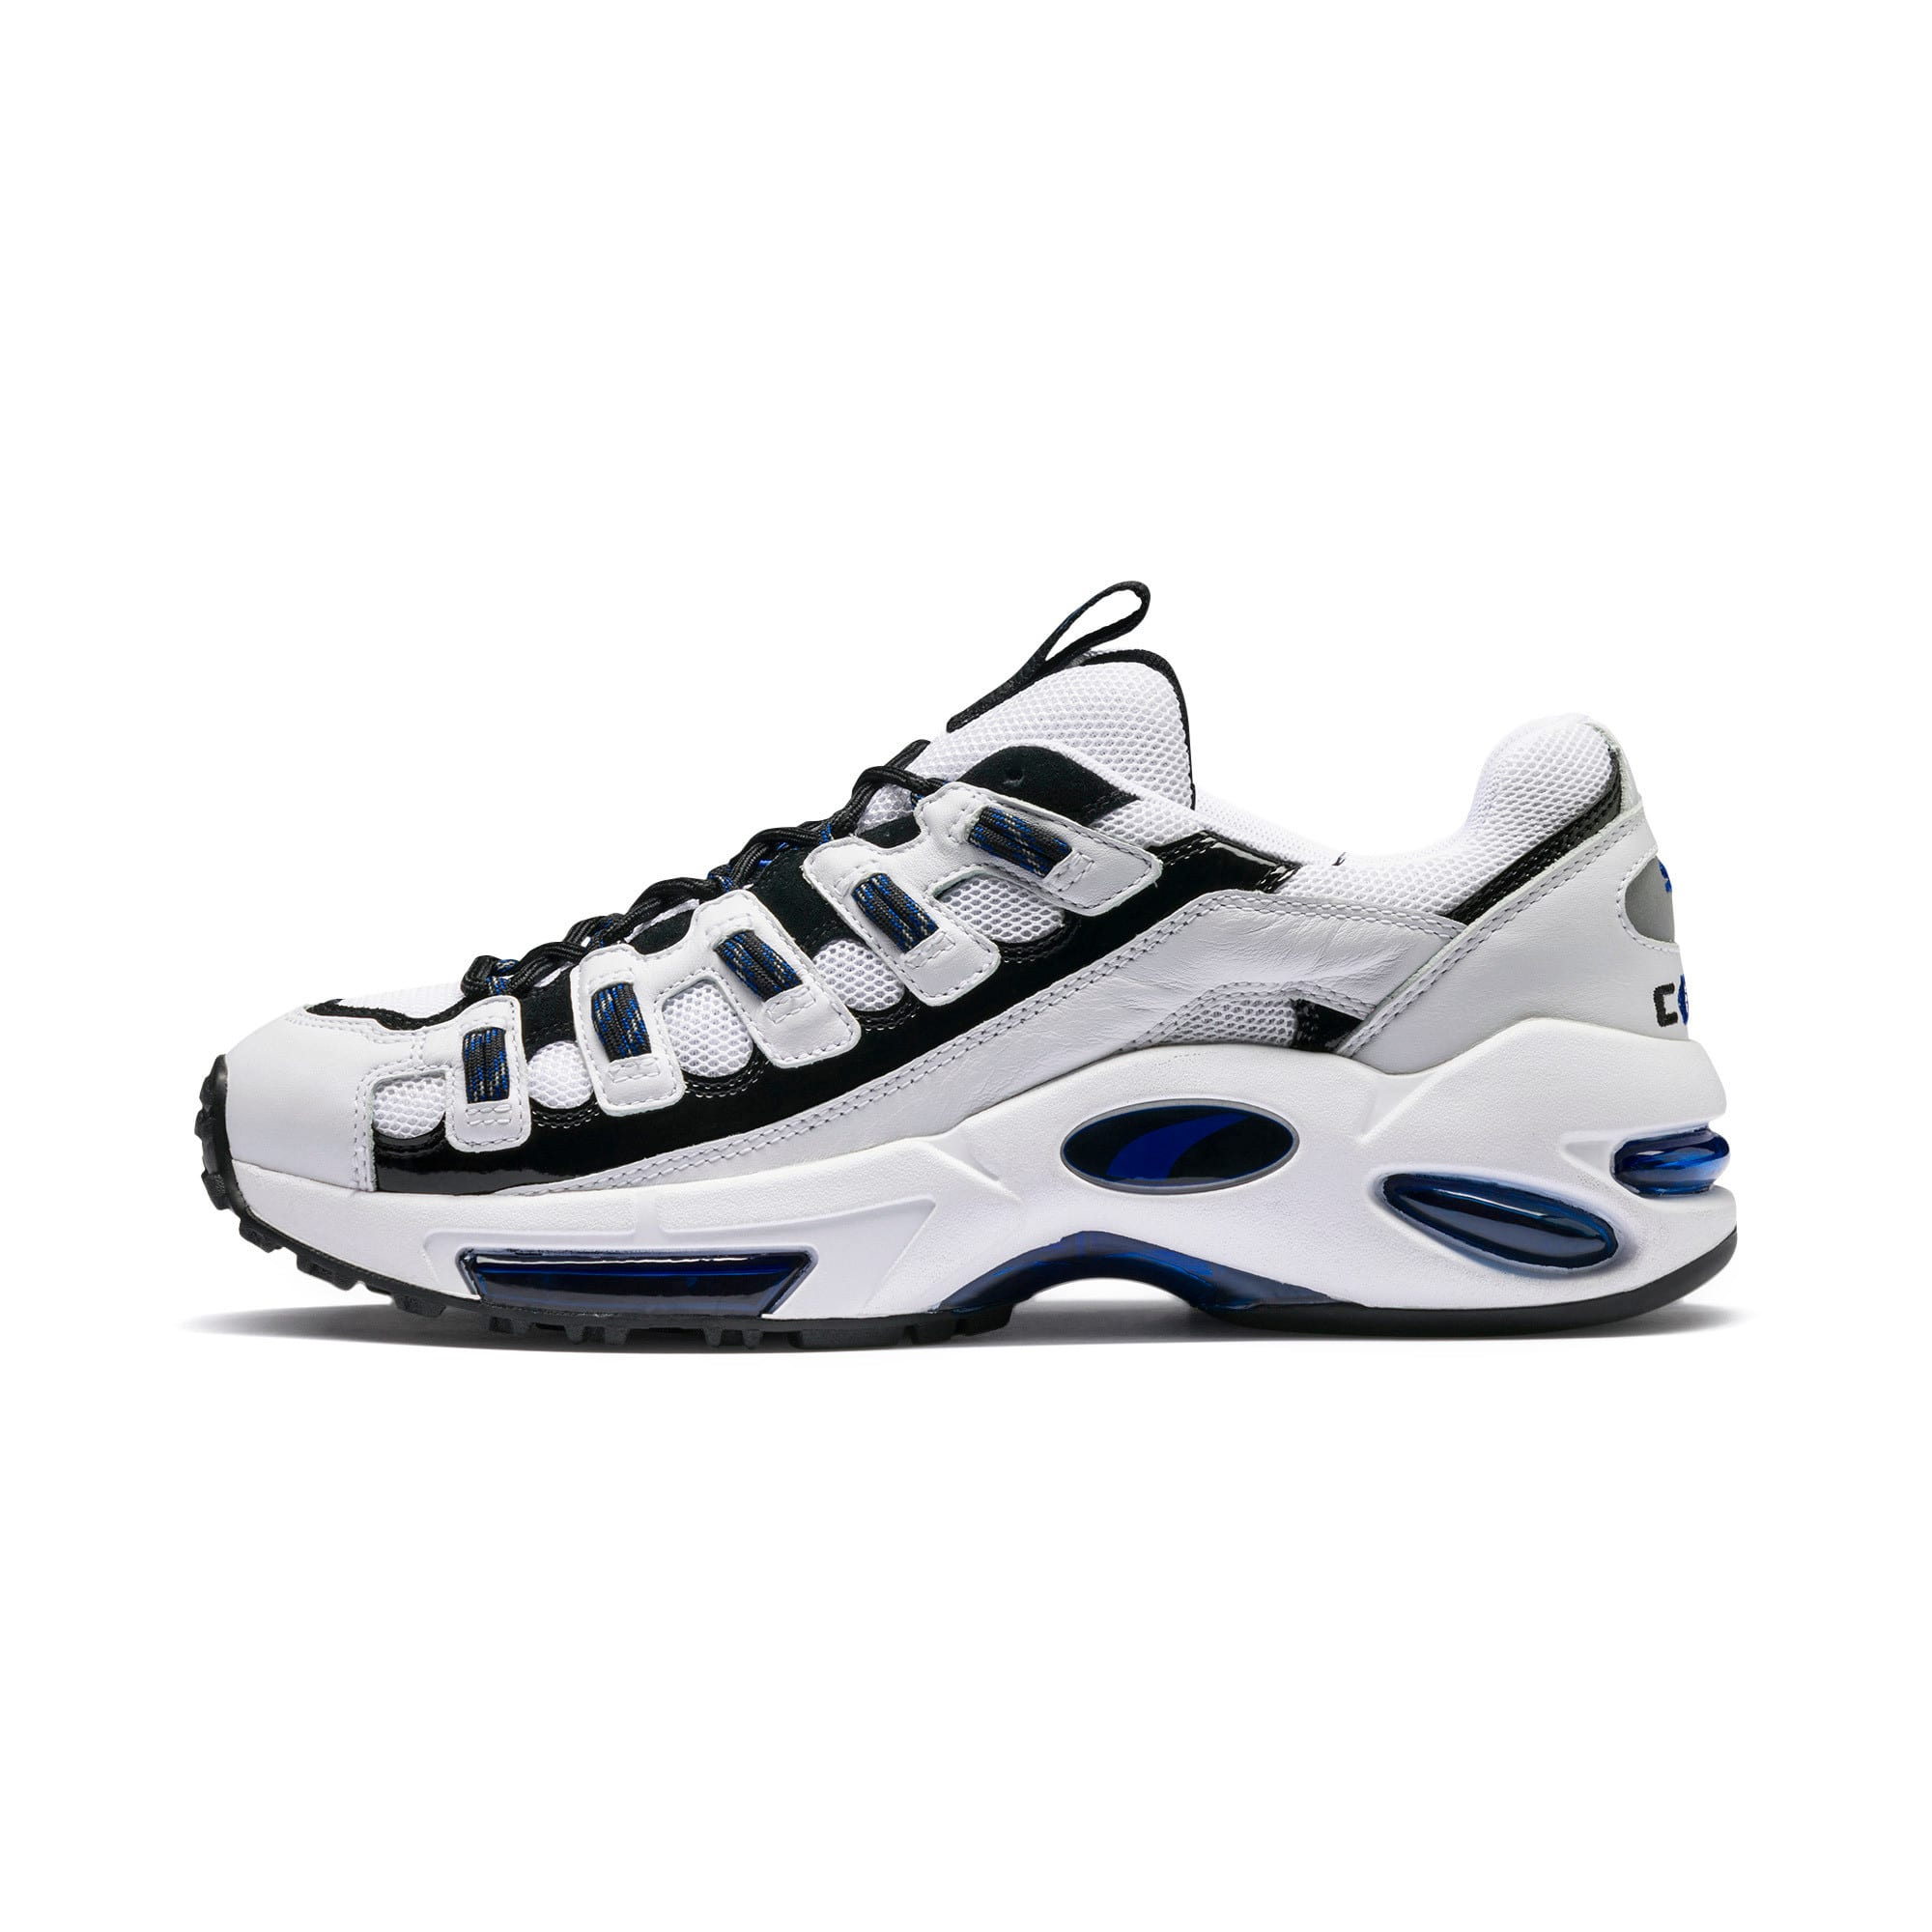 Thumbnail 1 of CELL Endura Patent 98 Men's Sneakers, Puma White-Surf The Web, medium